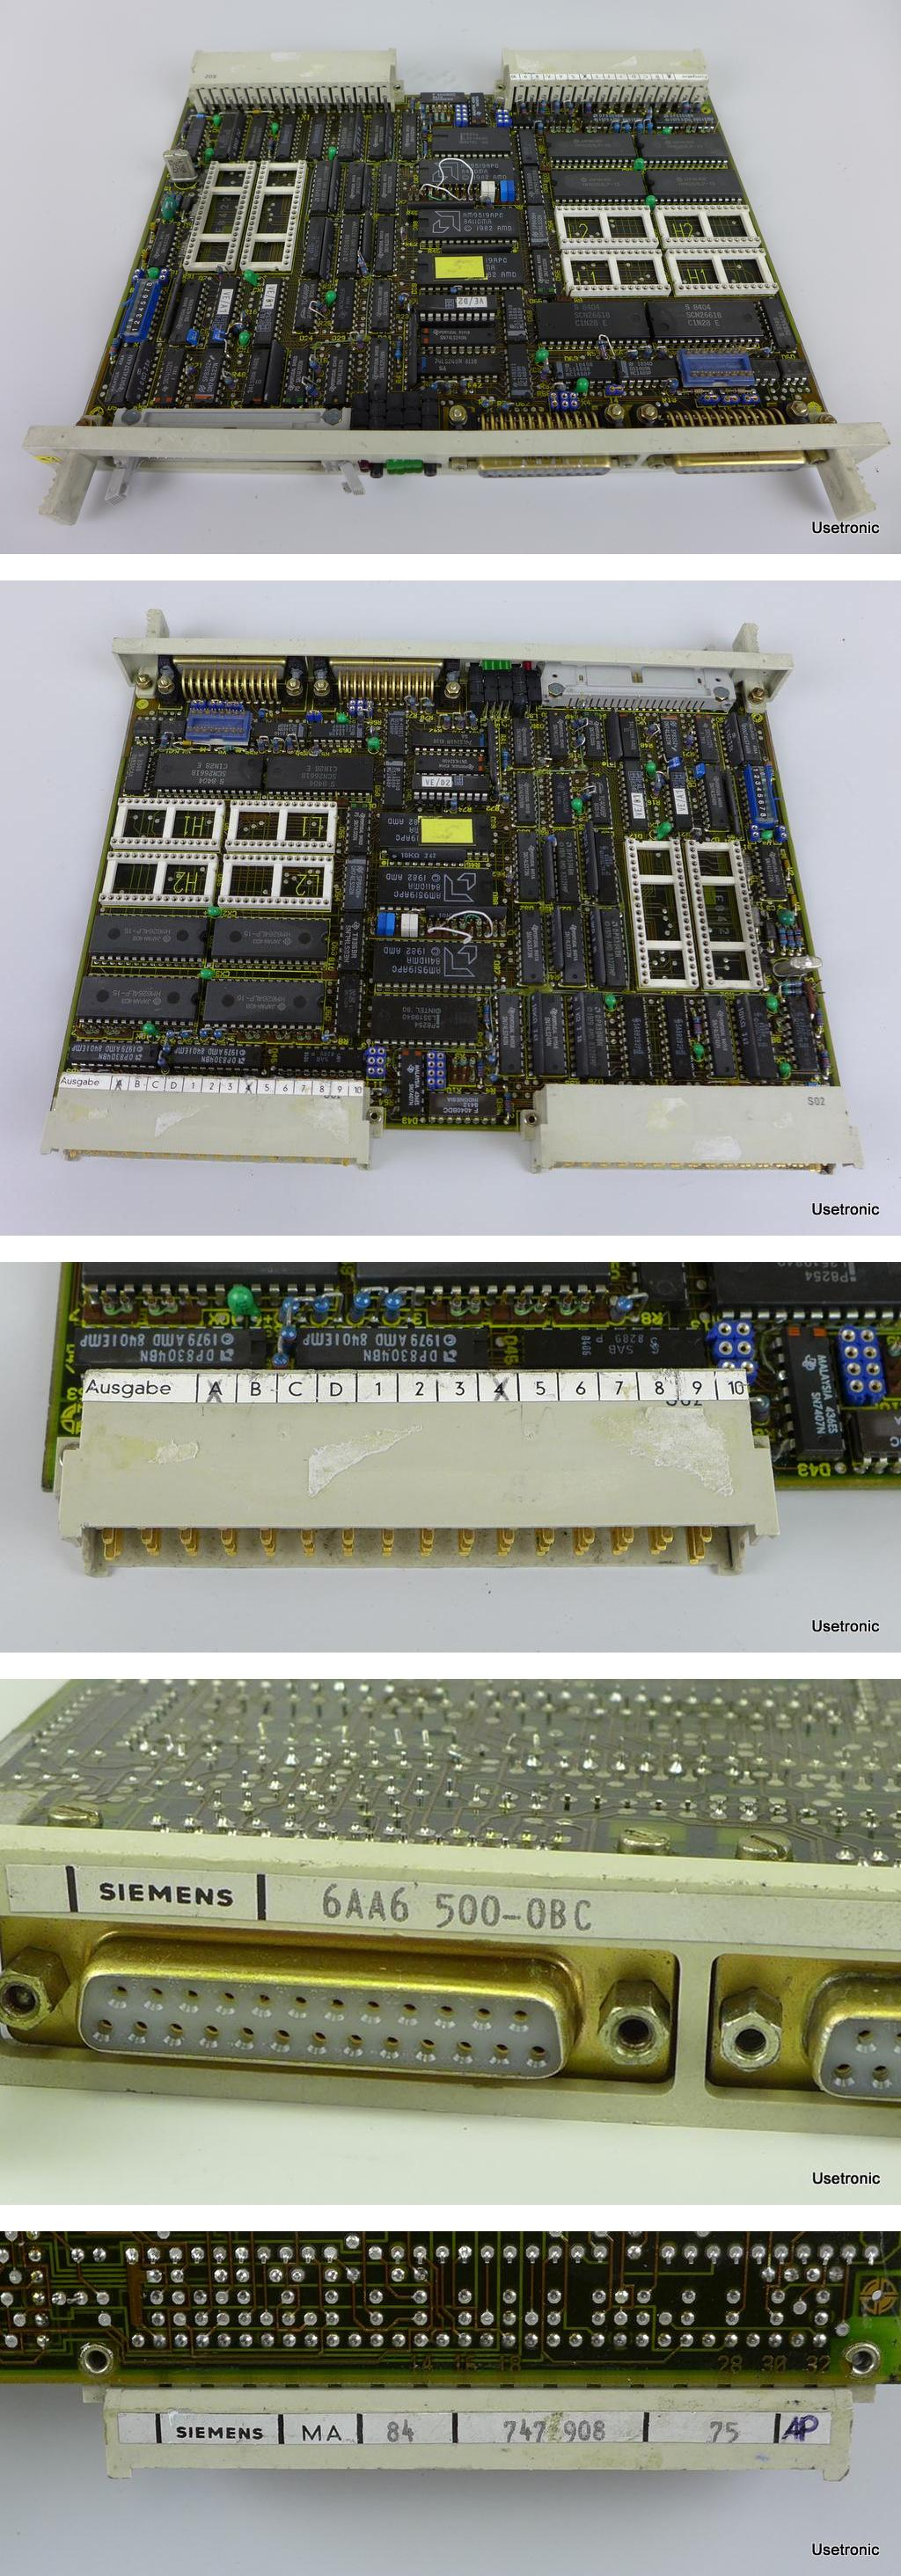 Siemens Sicomp MMC 6AA6 500-0BC